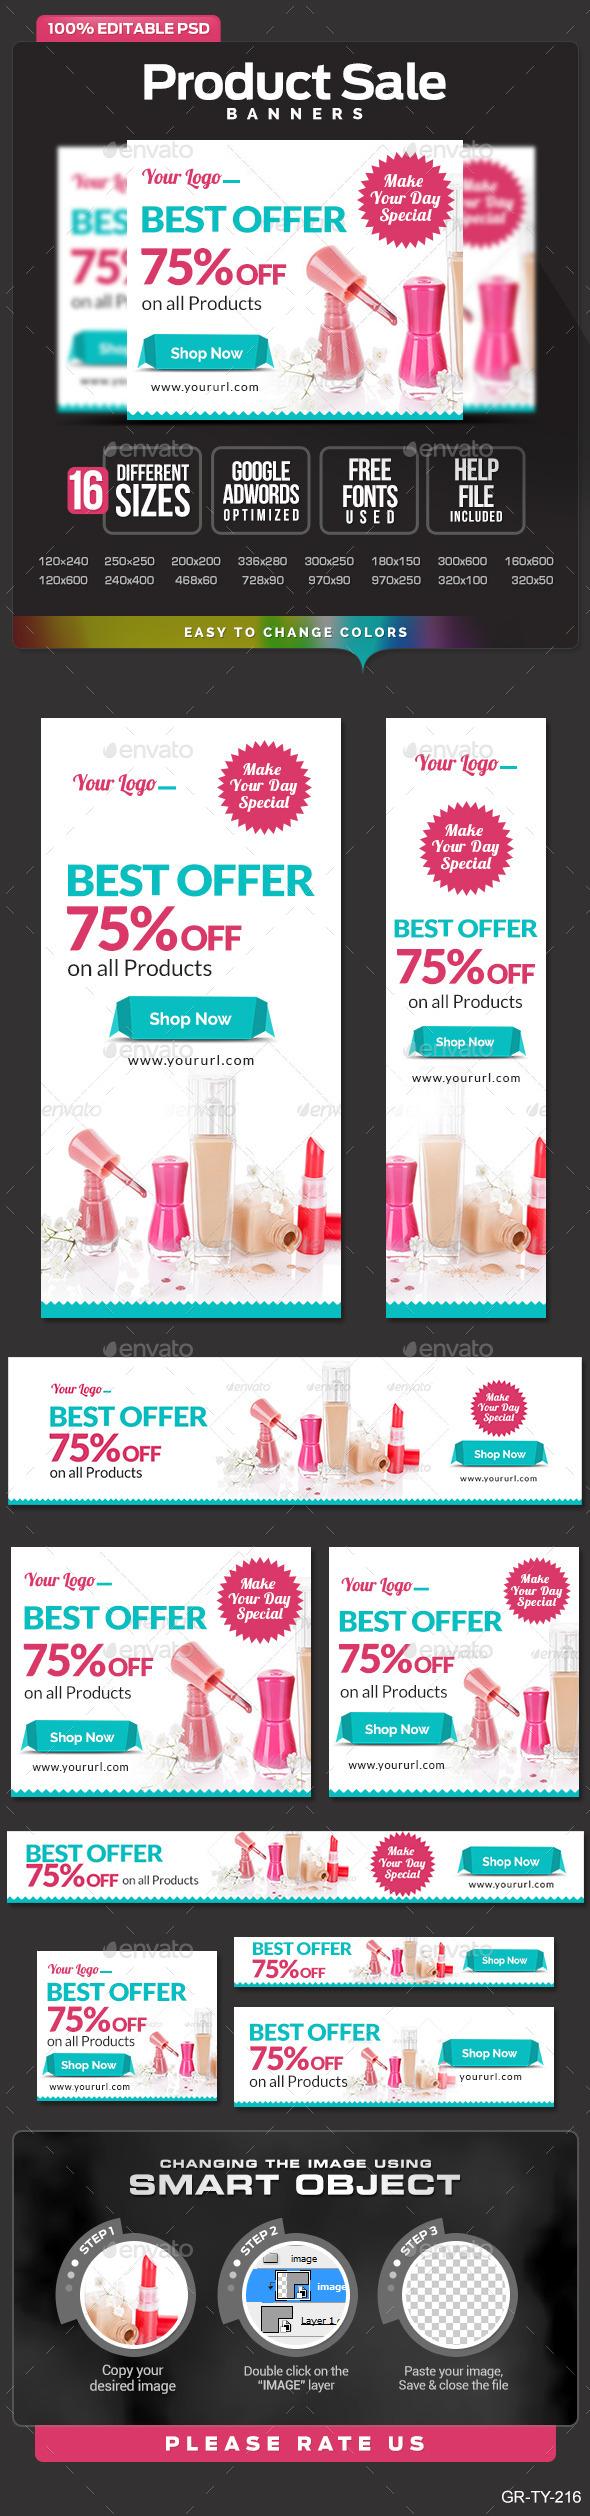 Banner design for e commerce - E Commerce Web Banner Design Set Banners Ads Web Elements